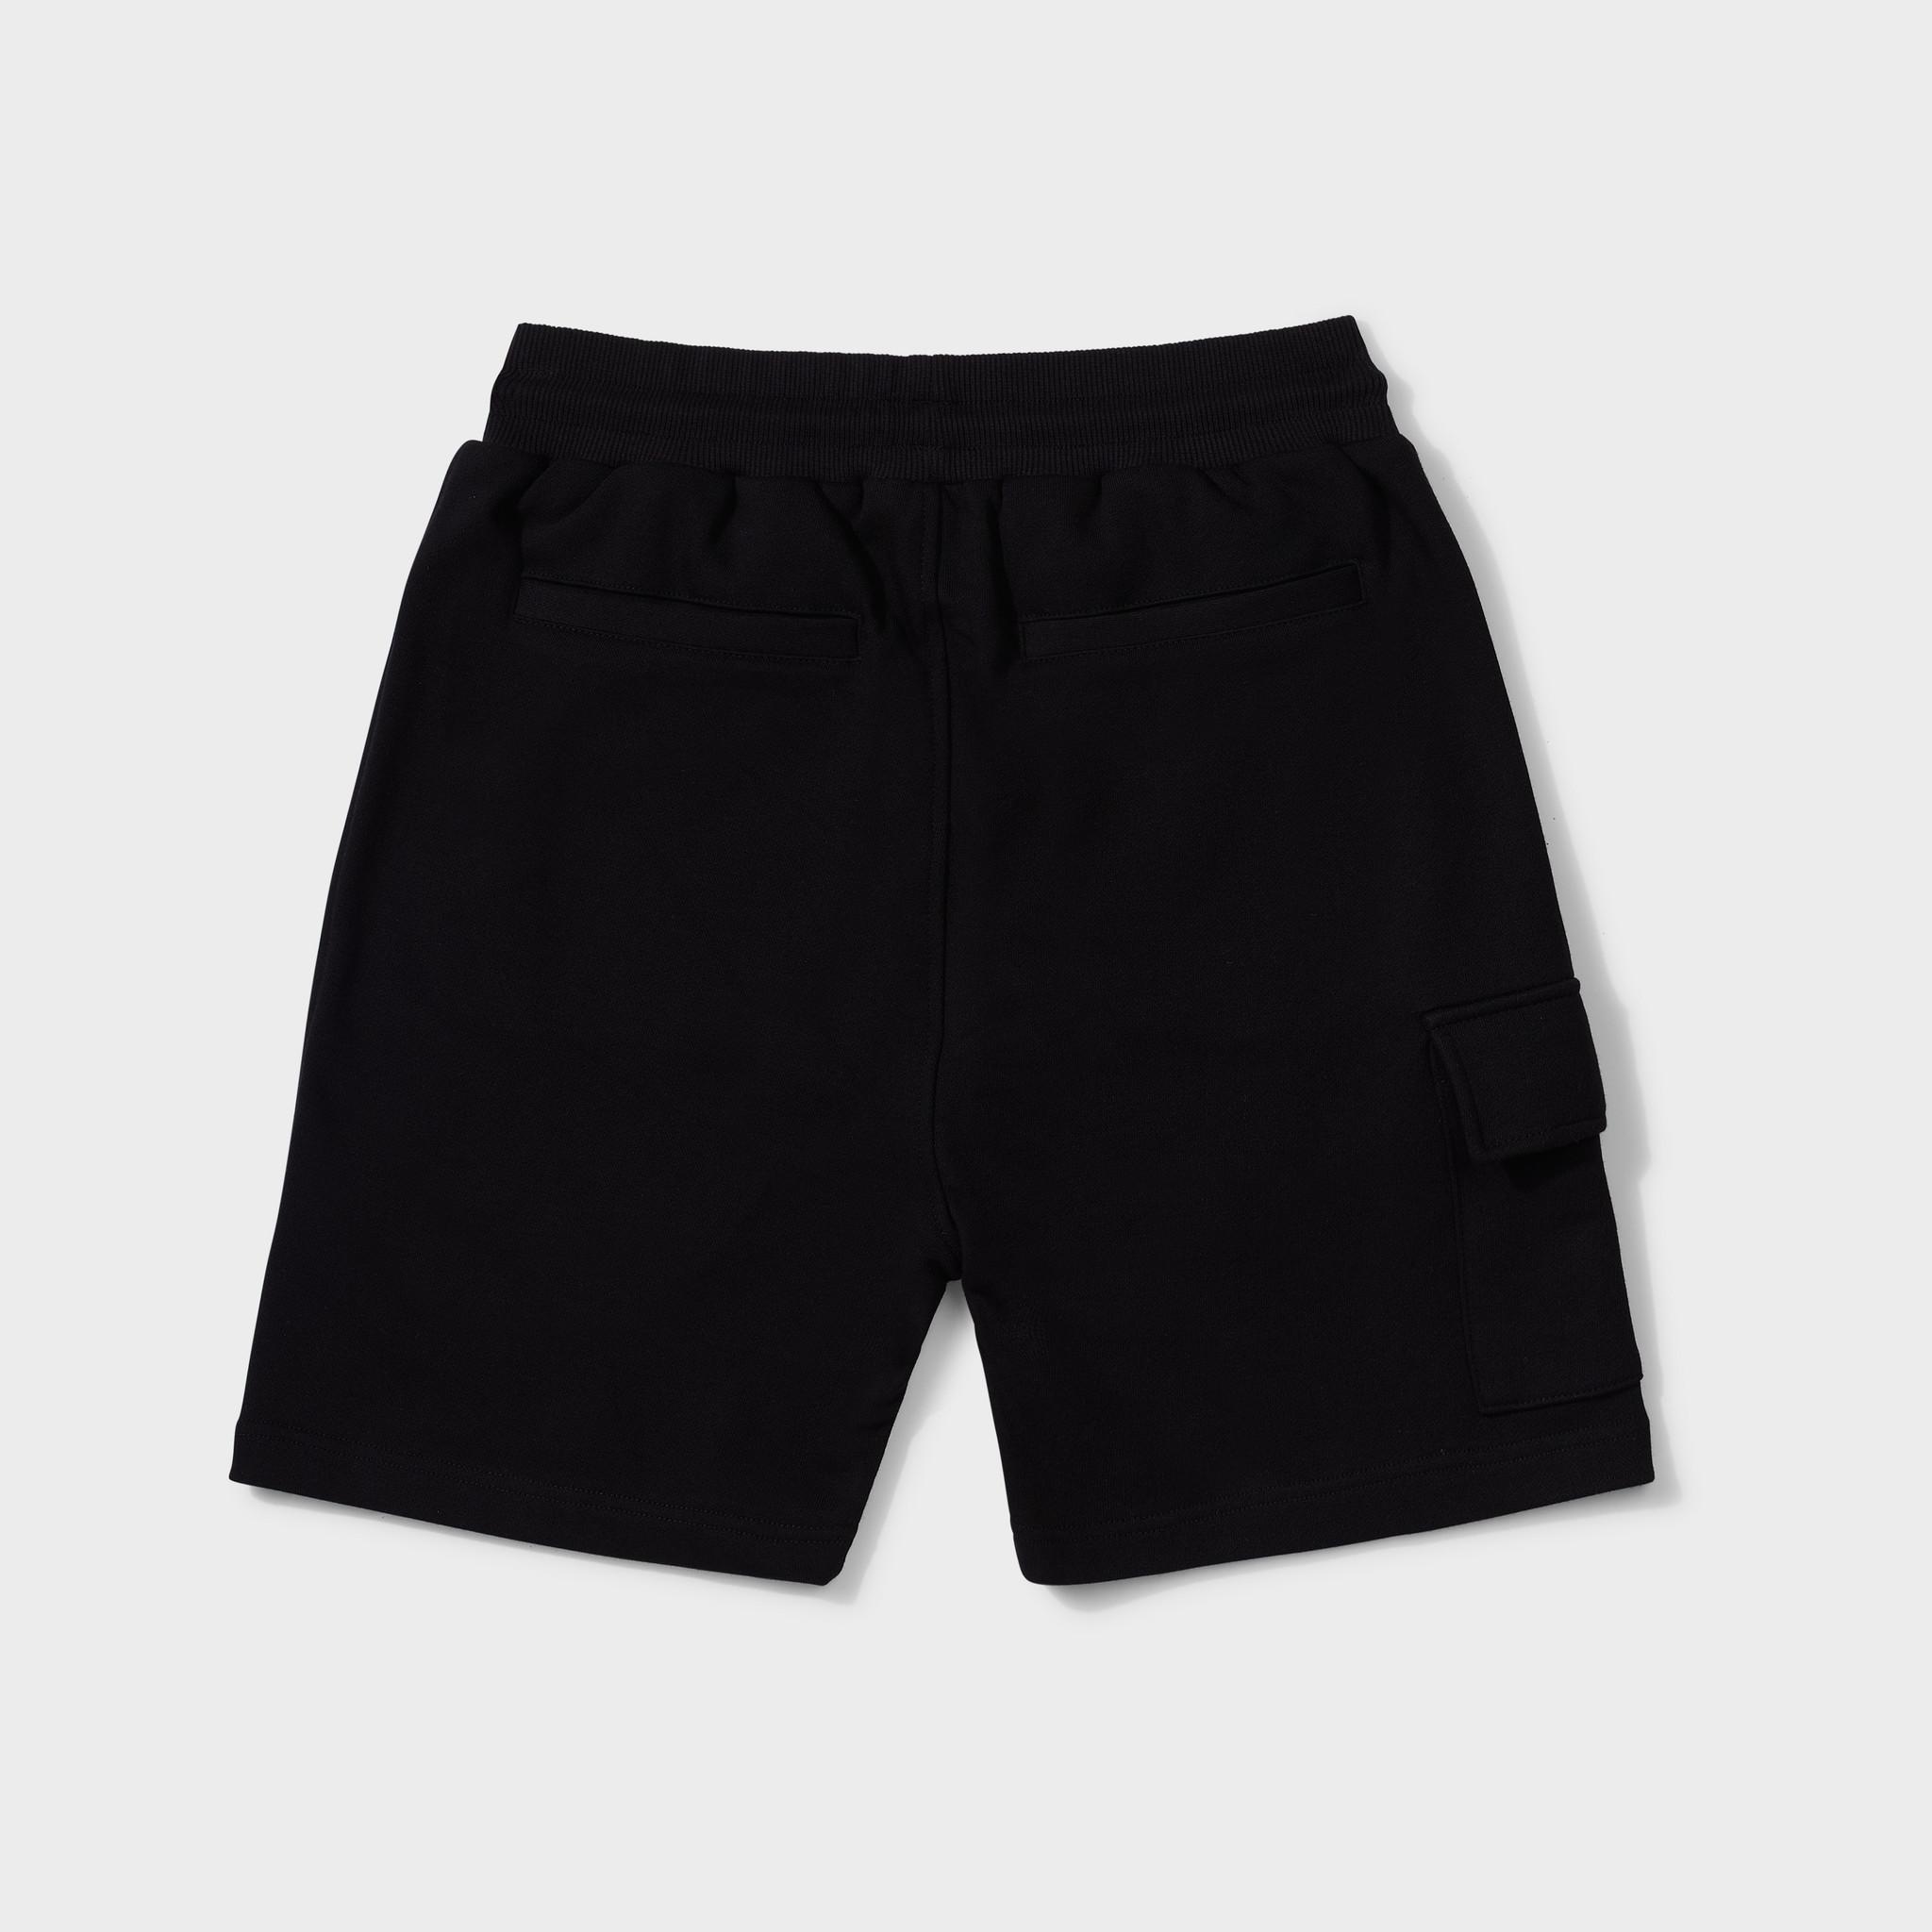 Wafi signature shorts black & white-2